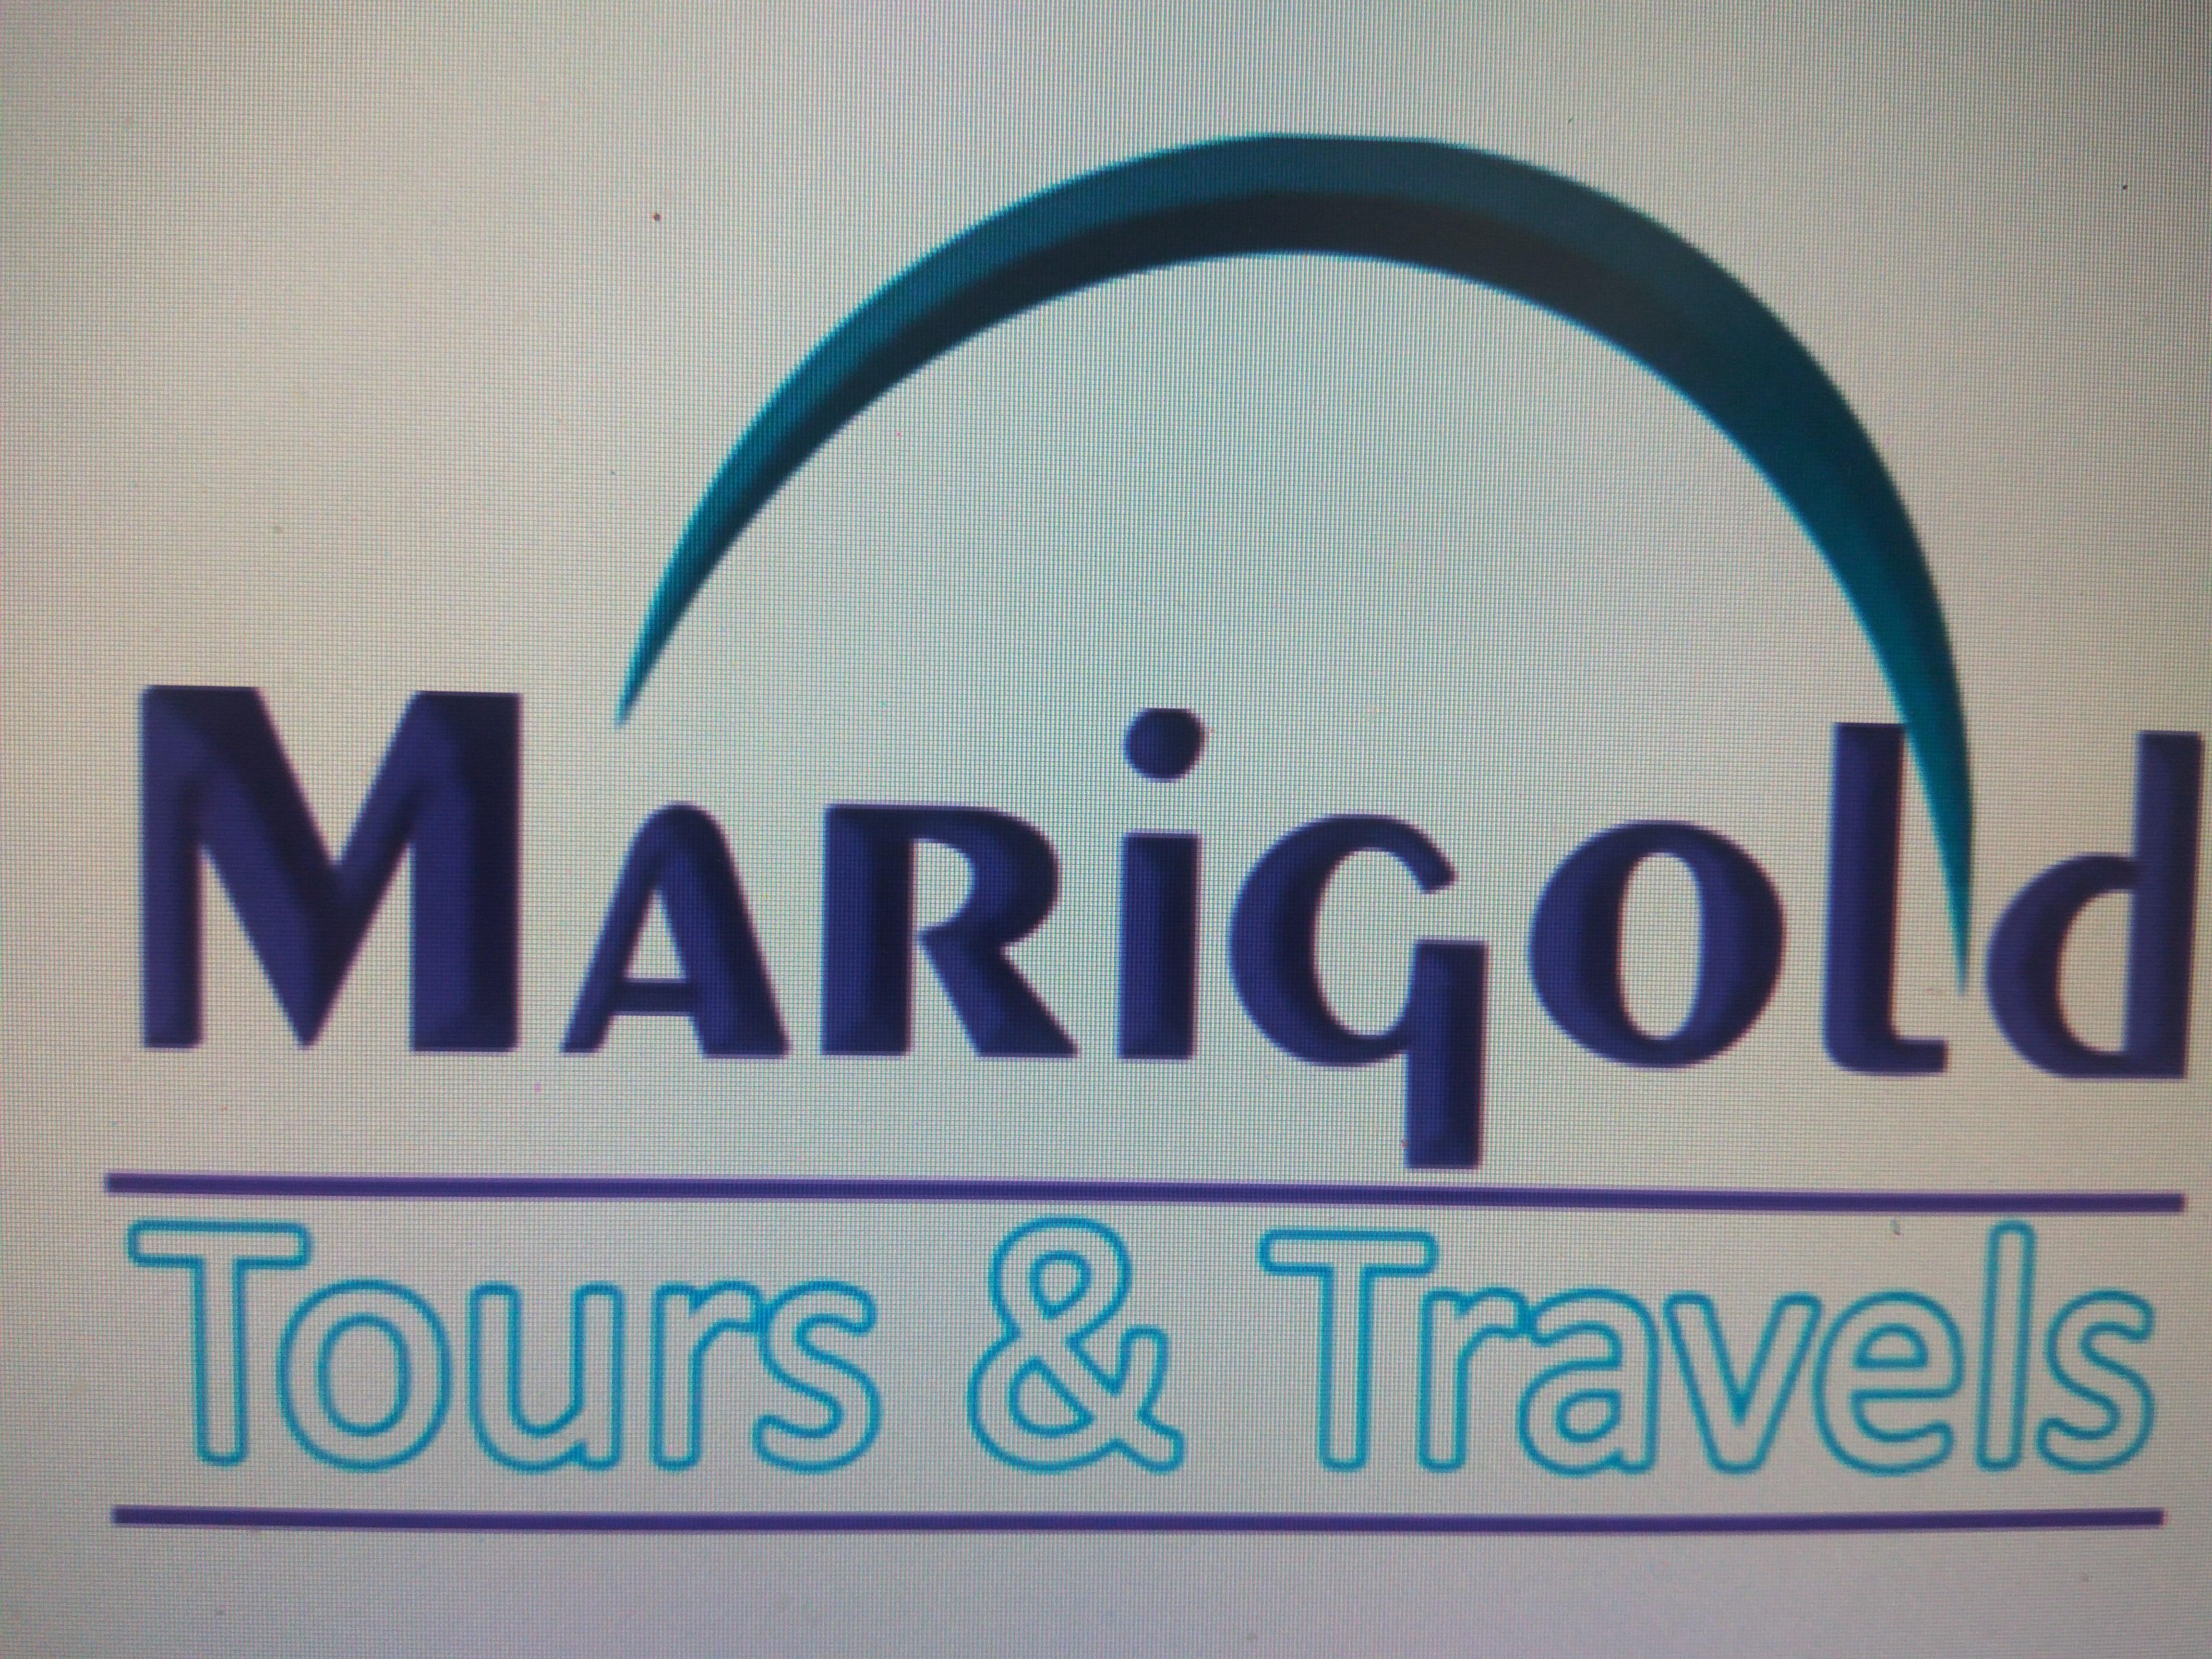 Marigold Tours & Travels in Prahlad Nagar, Ahmedabad-380015